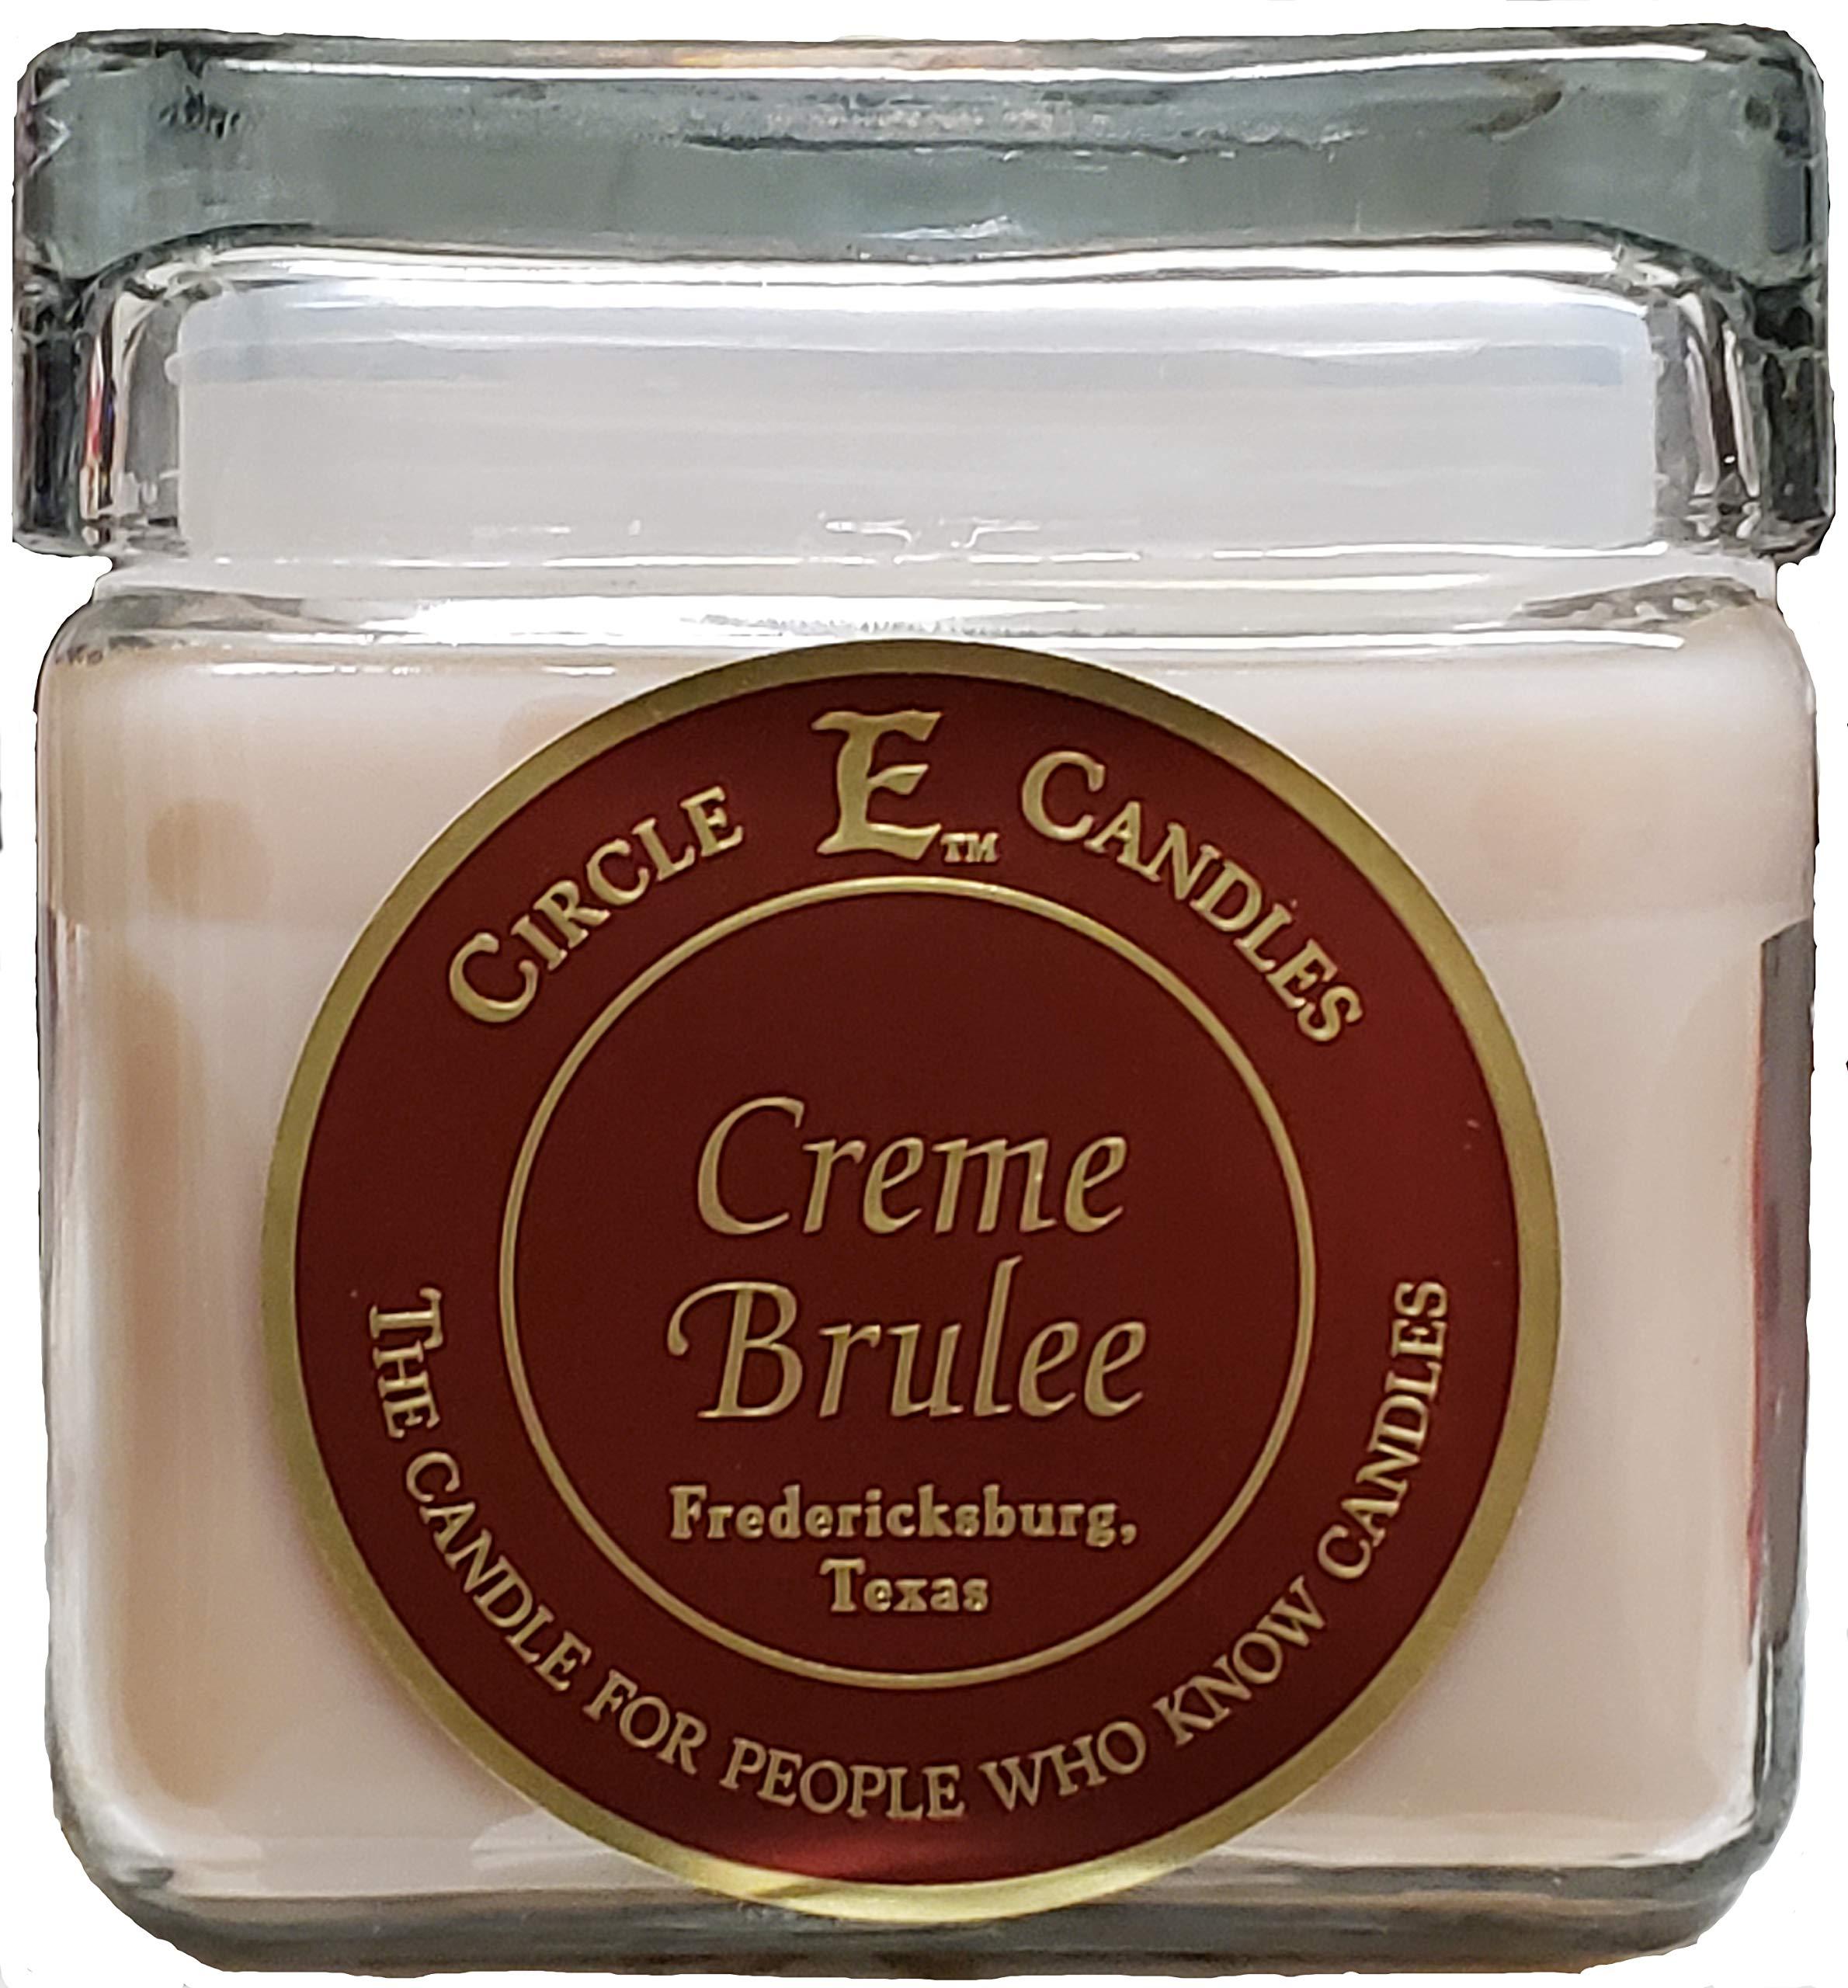 Circle E Candles 28oz Creme Brulee